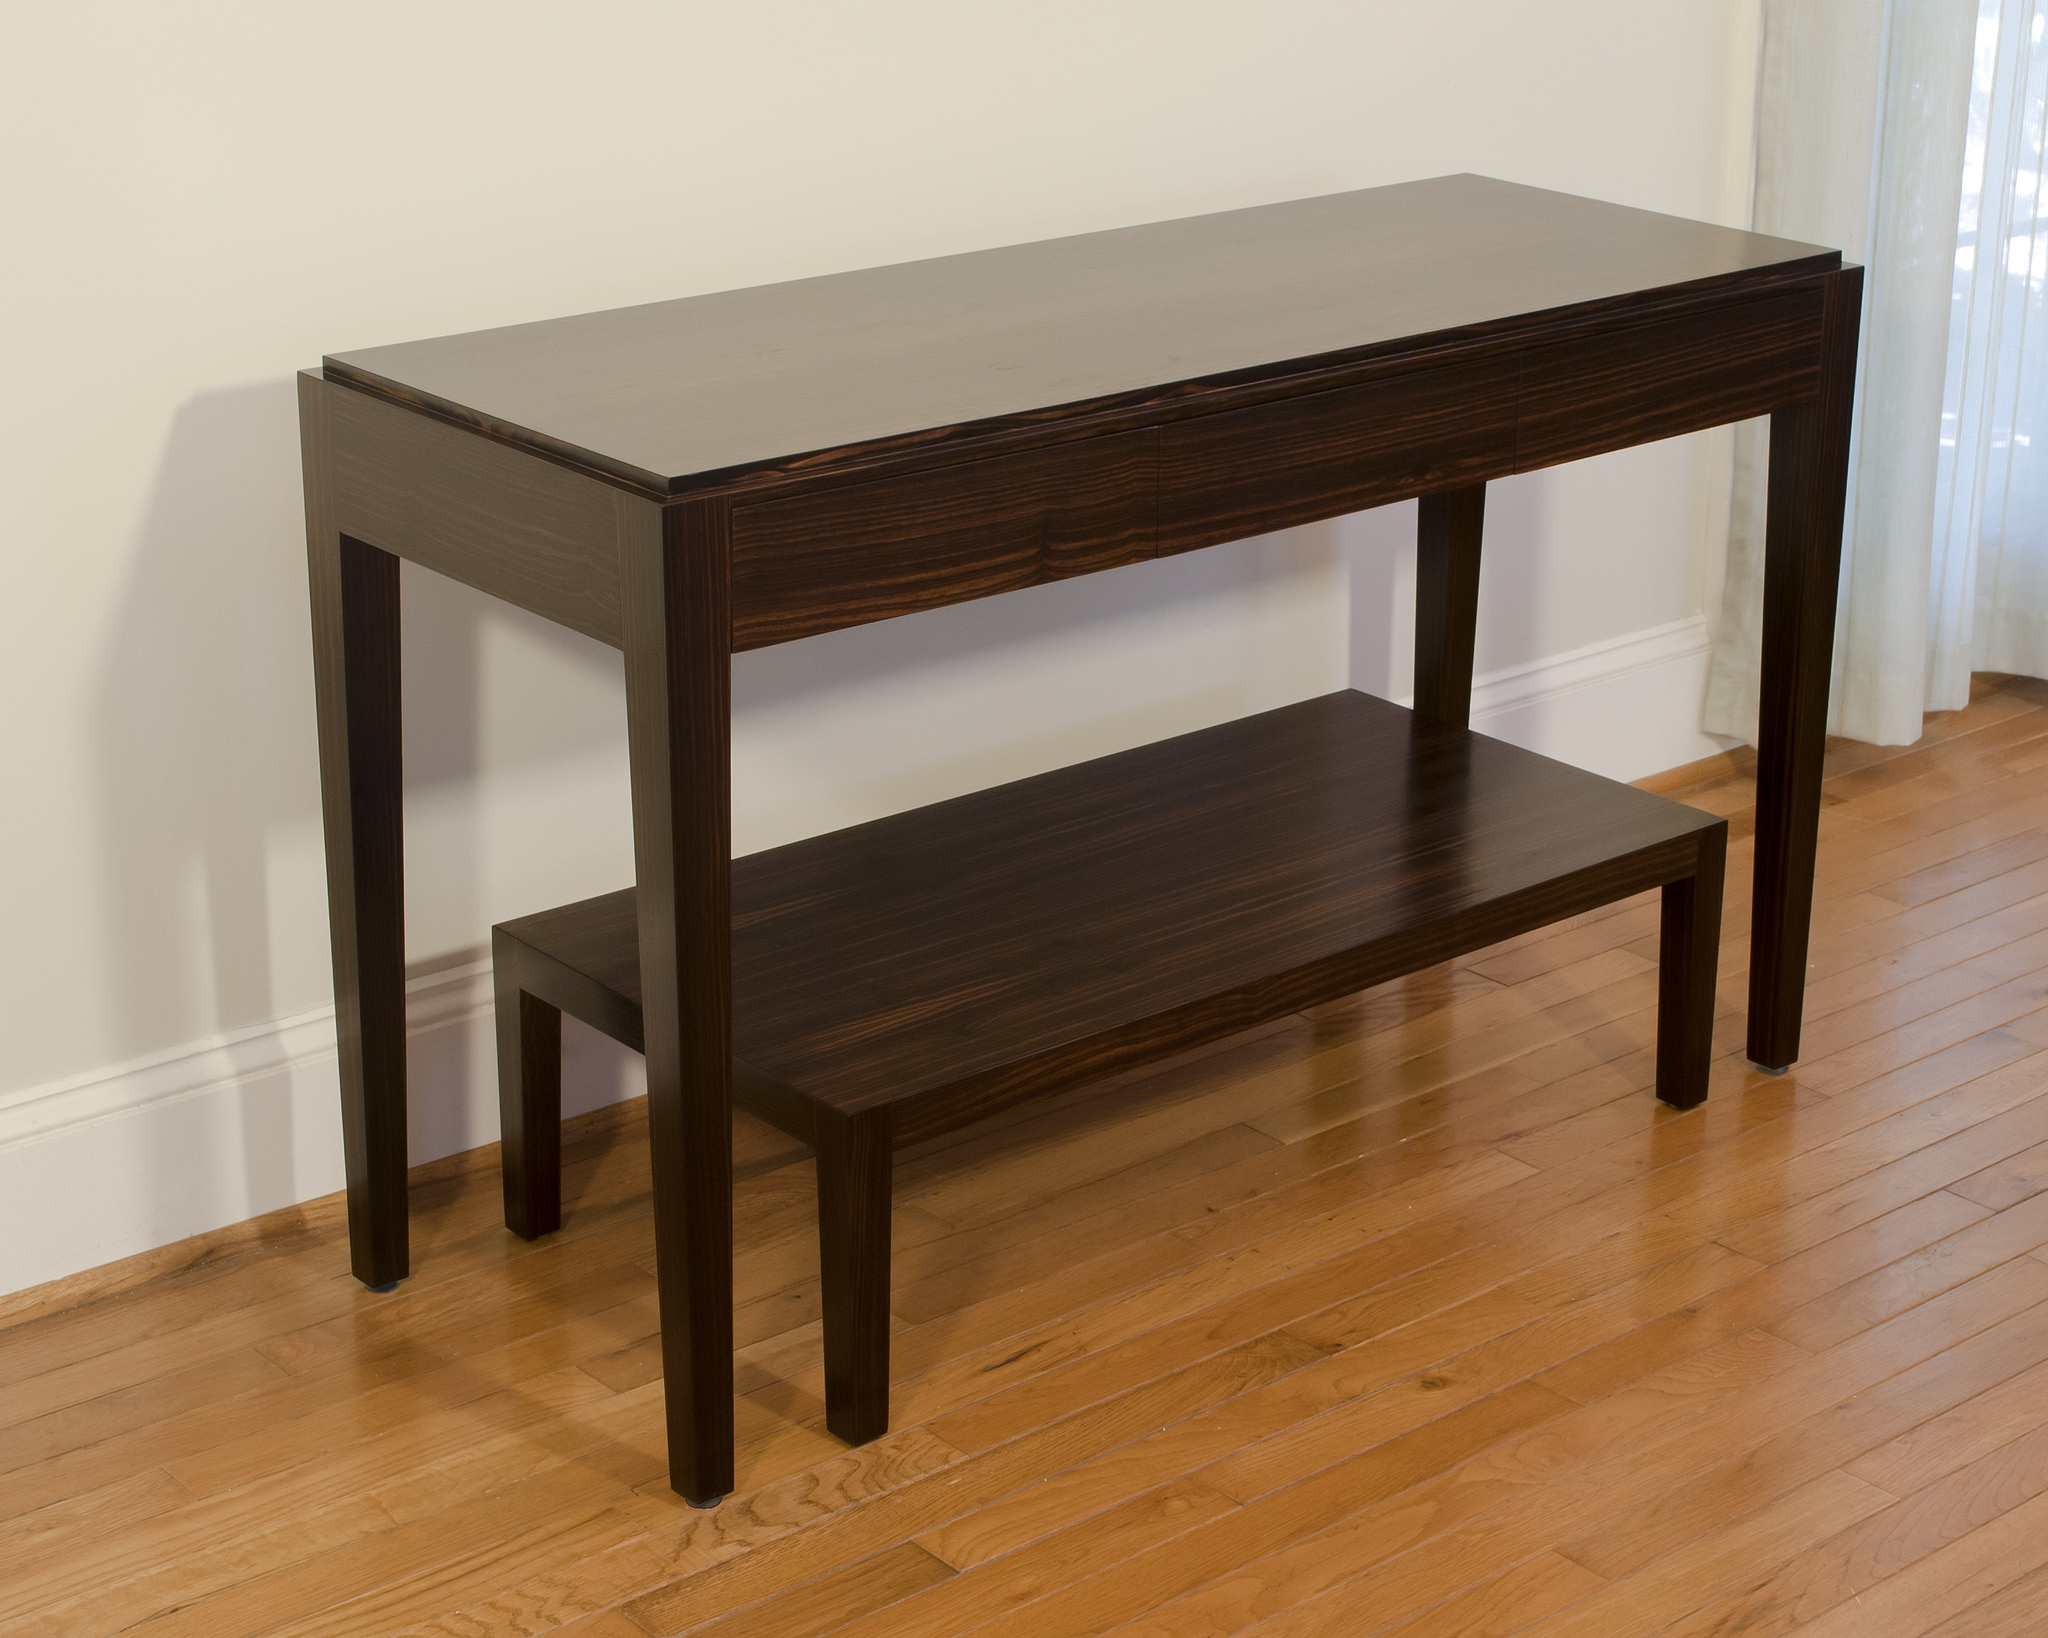 Macassar-Ebony-desk-1.jpg